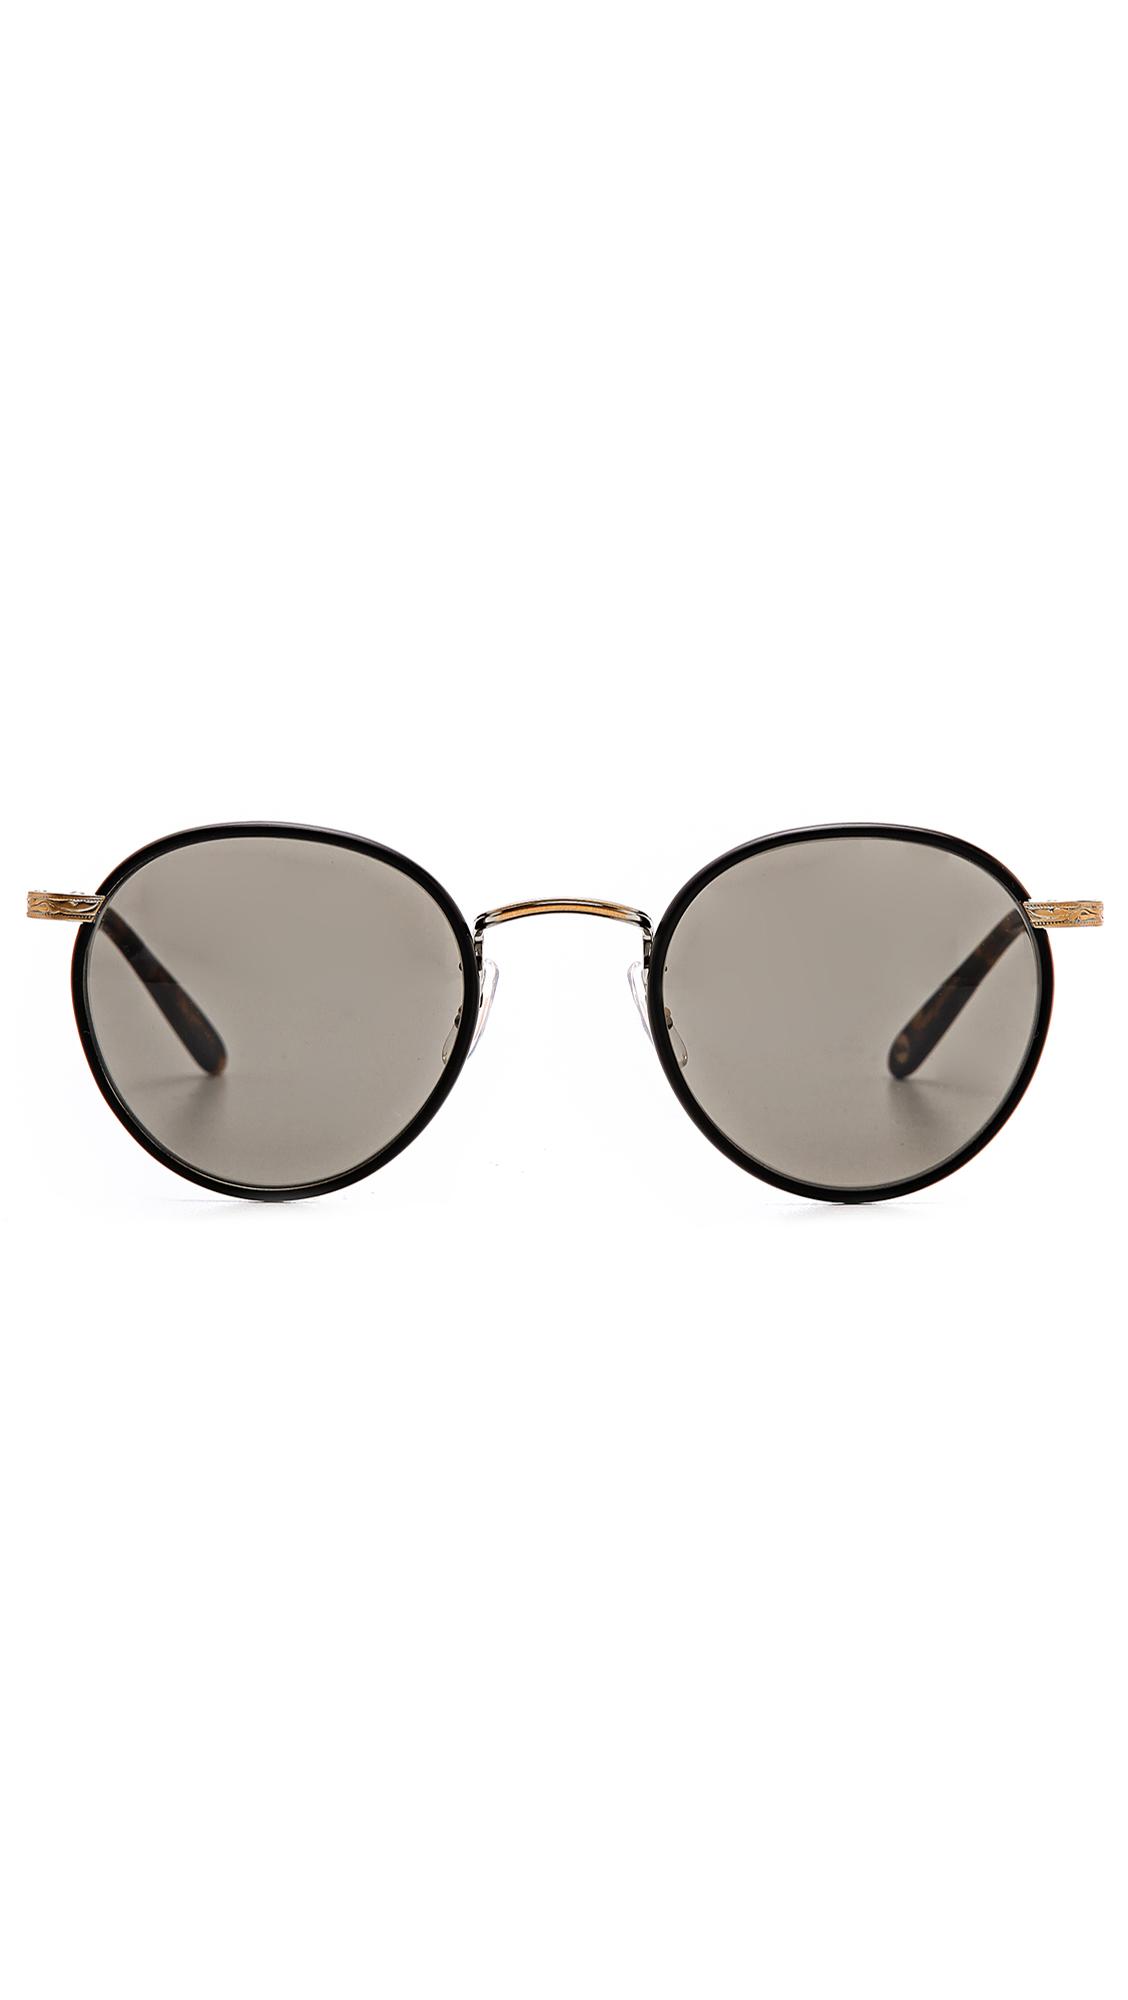 Garrett Leight Wilson Sunglasses in Black